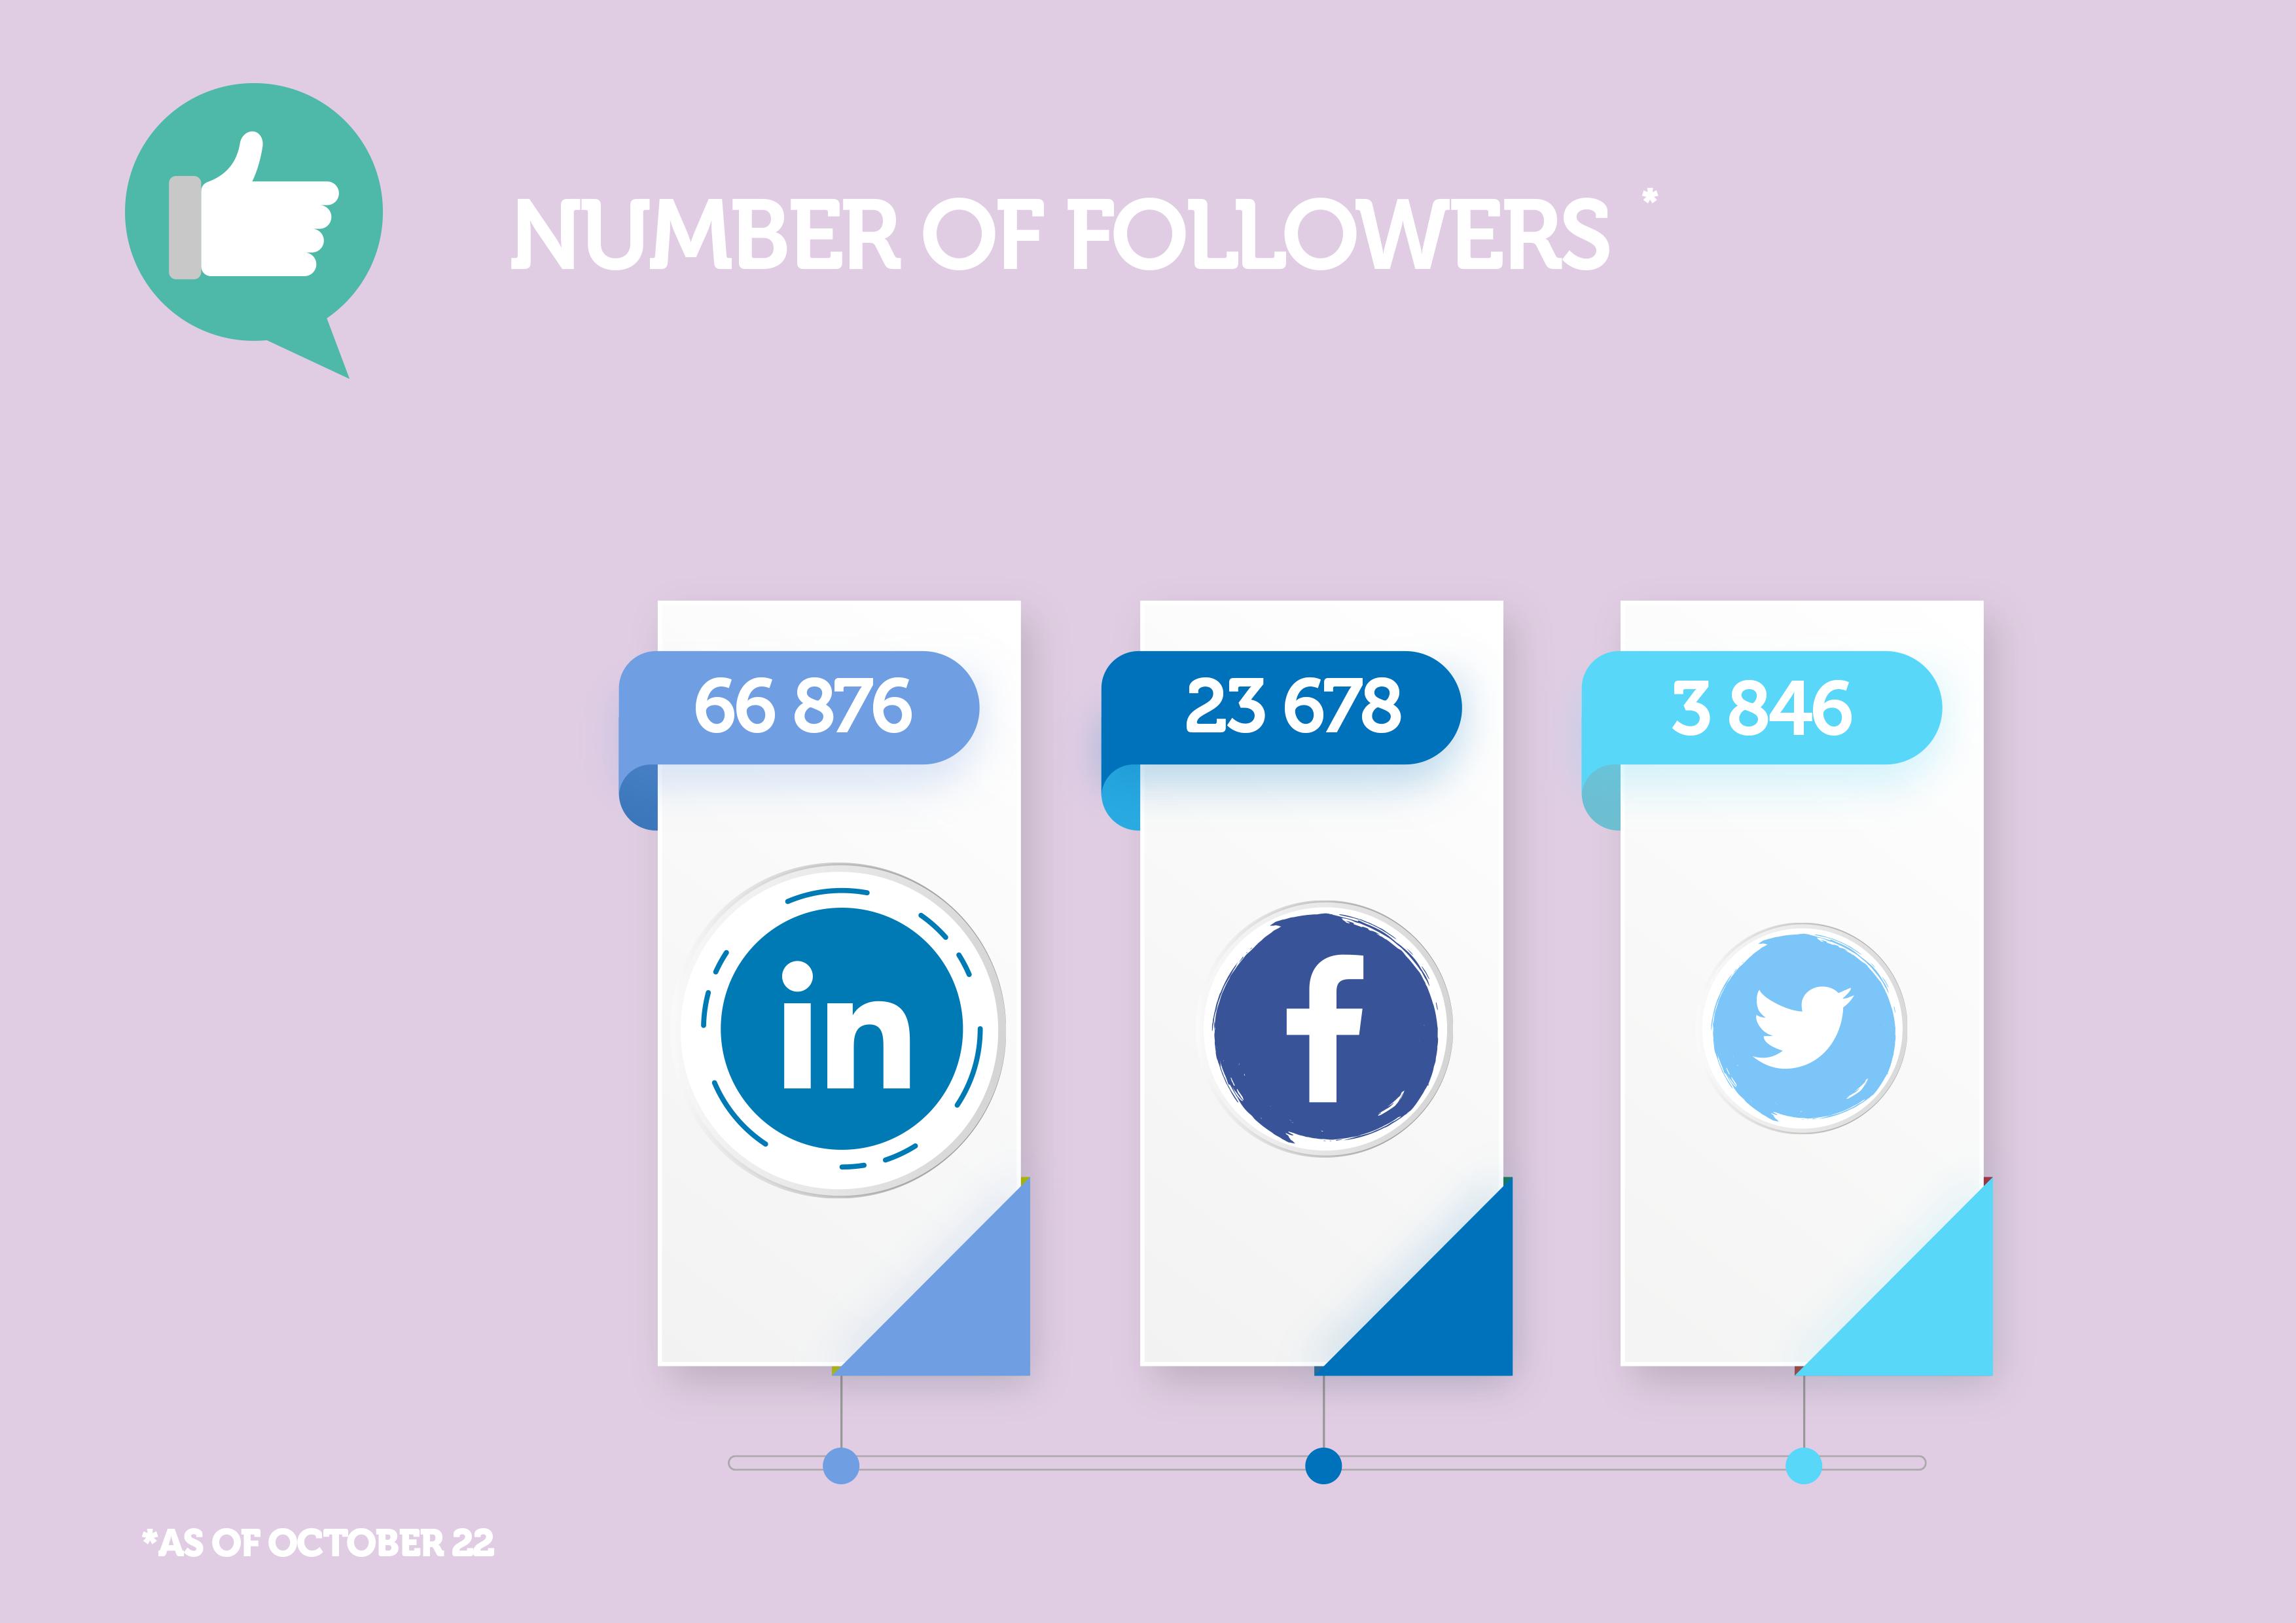 Number of Vallourec followers on social media